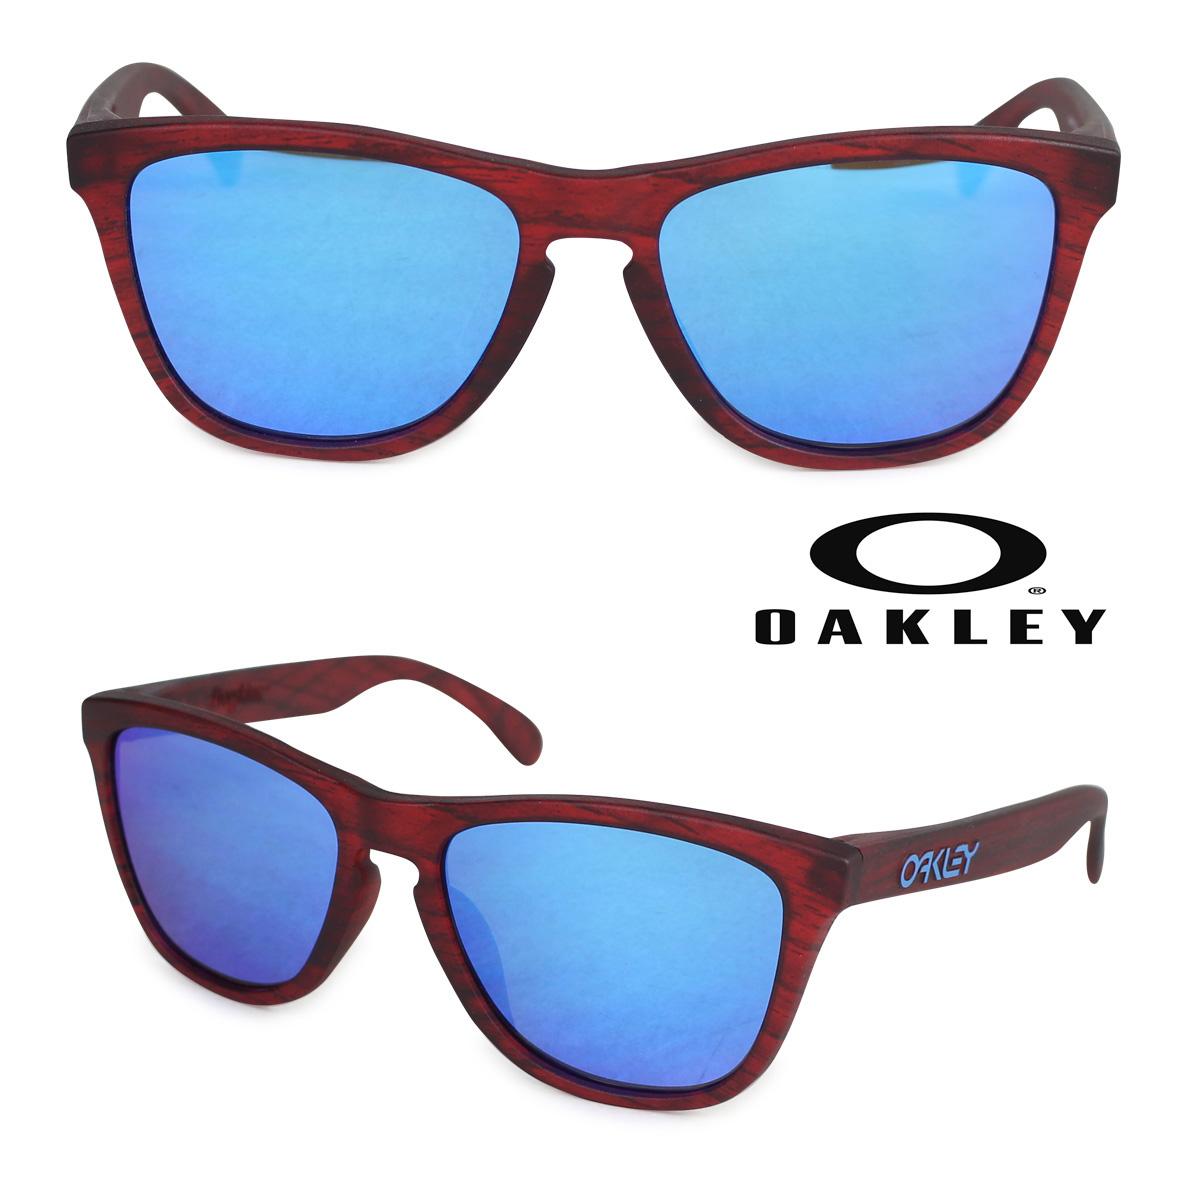 Oakley サングラス アジアンフィット オークリー Frogskins フロッグスキン DRIFTWOOD COLLECTION ASIA FIT OO9245-5654 メンズ レディース